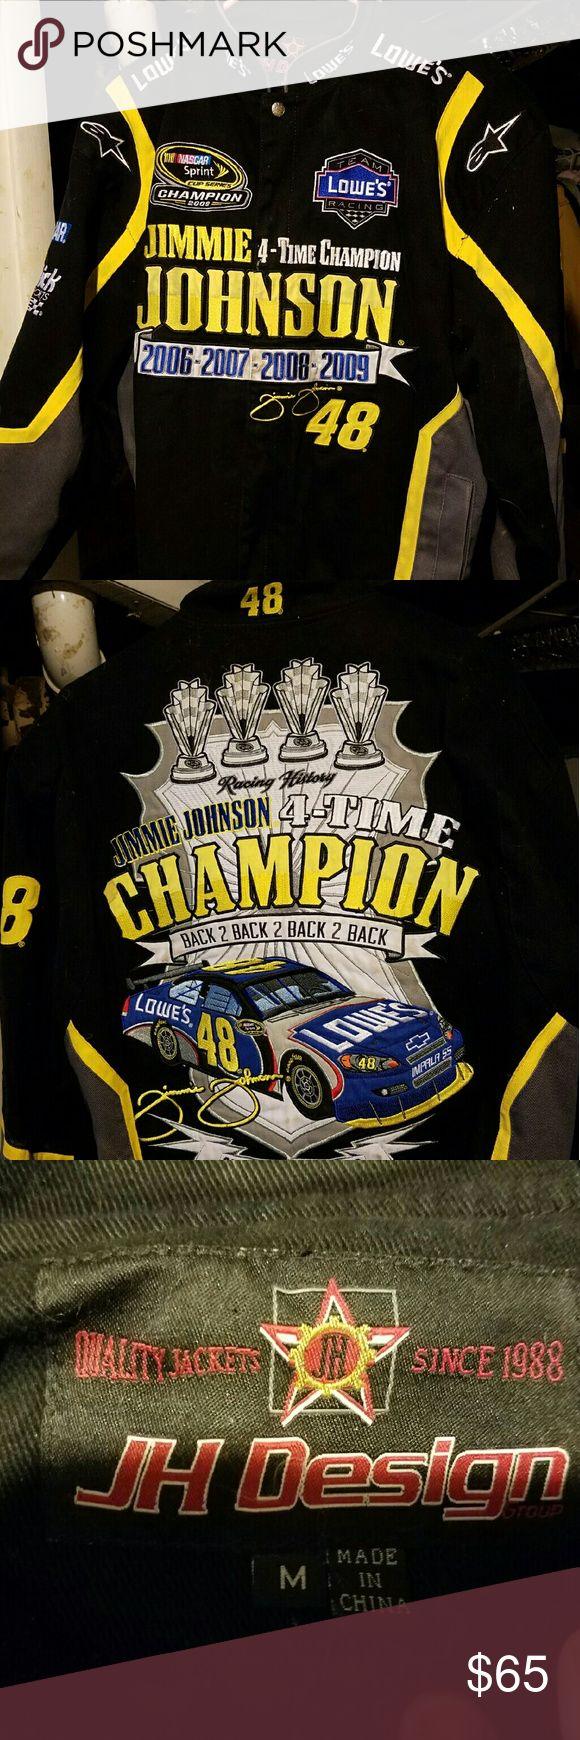 Jimmie Johnson NASCAR Jacket Anniversary addition Jimmie Johnson jacket Jackets & Coats